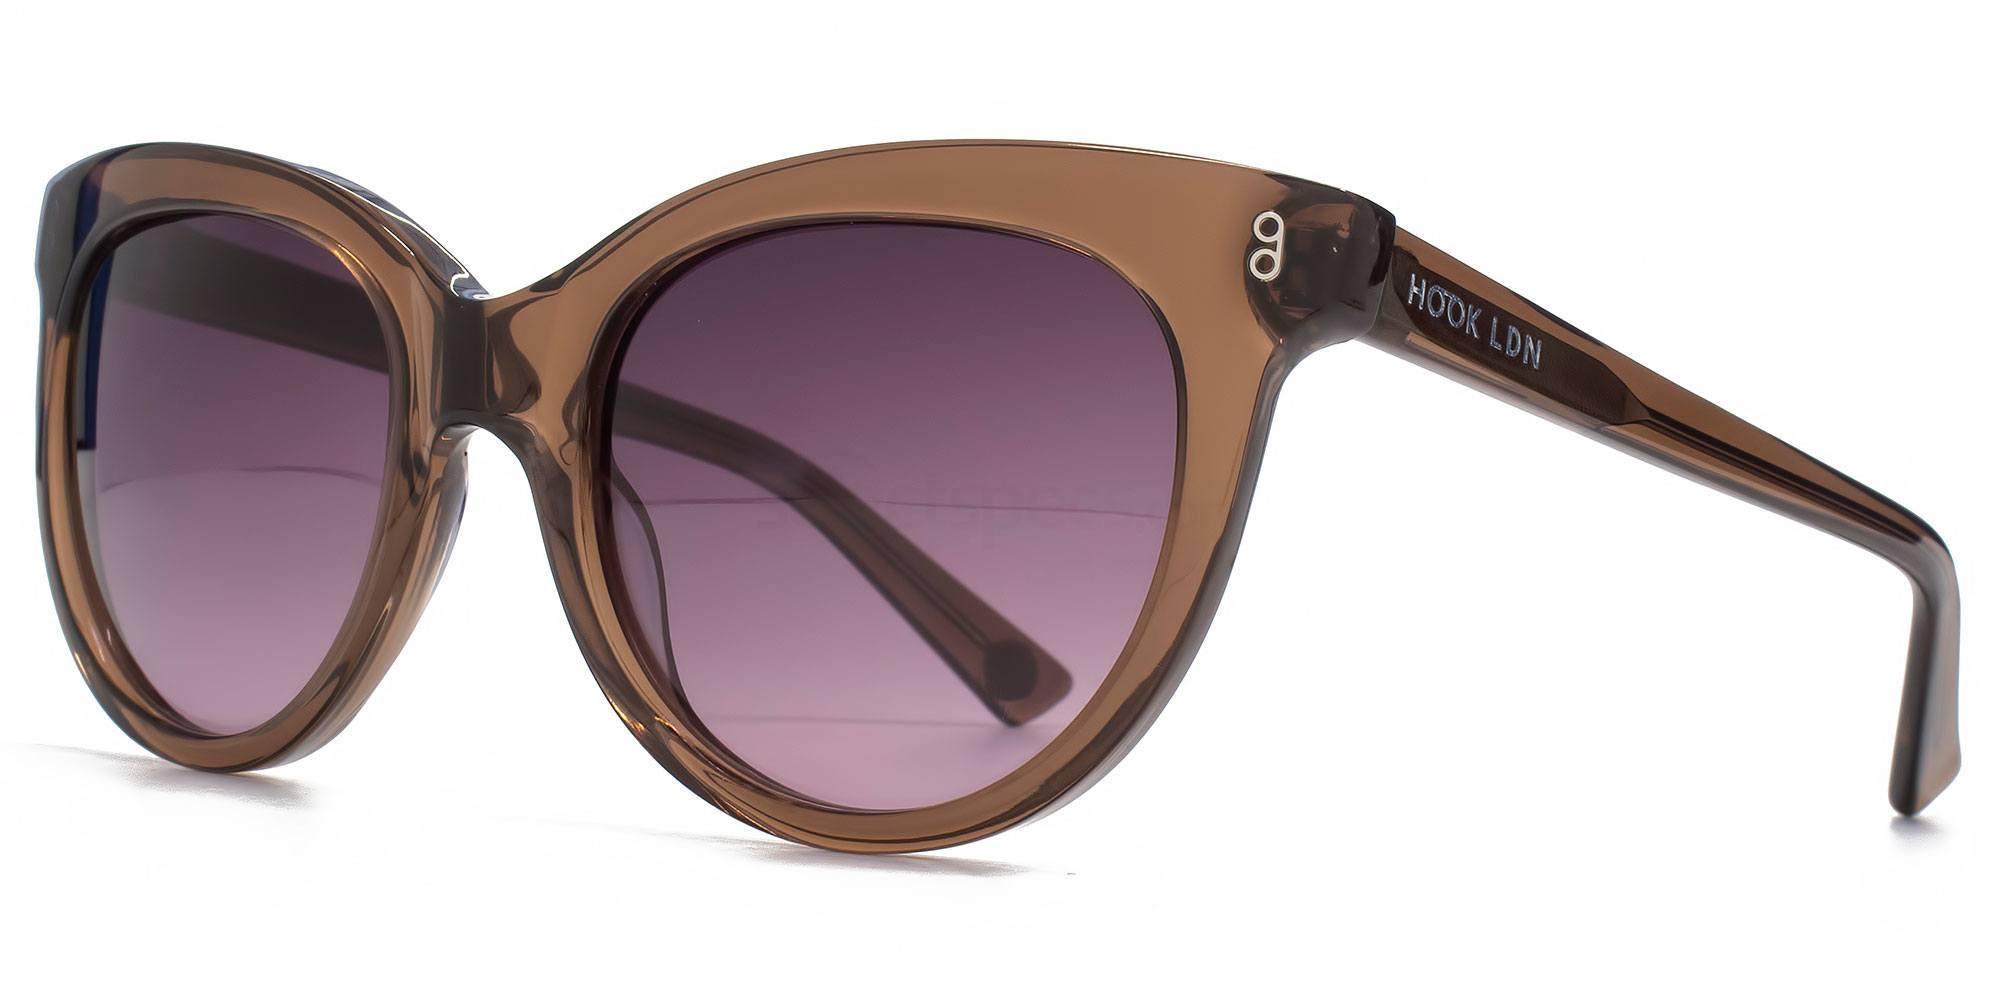 BRN HK007 - WANDER Sunglasses, Hook LDN